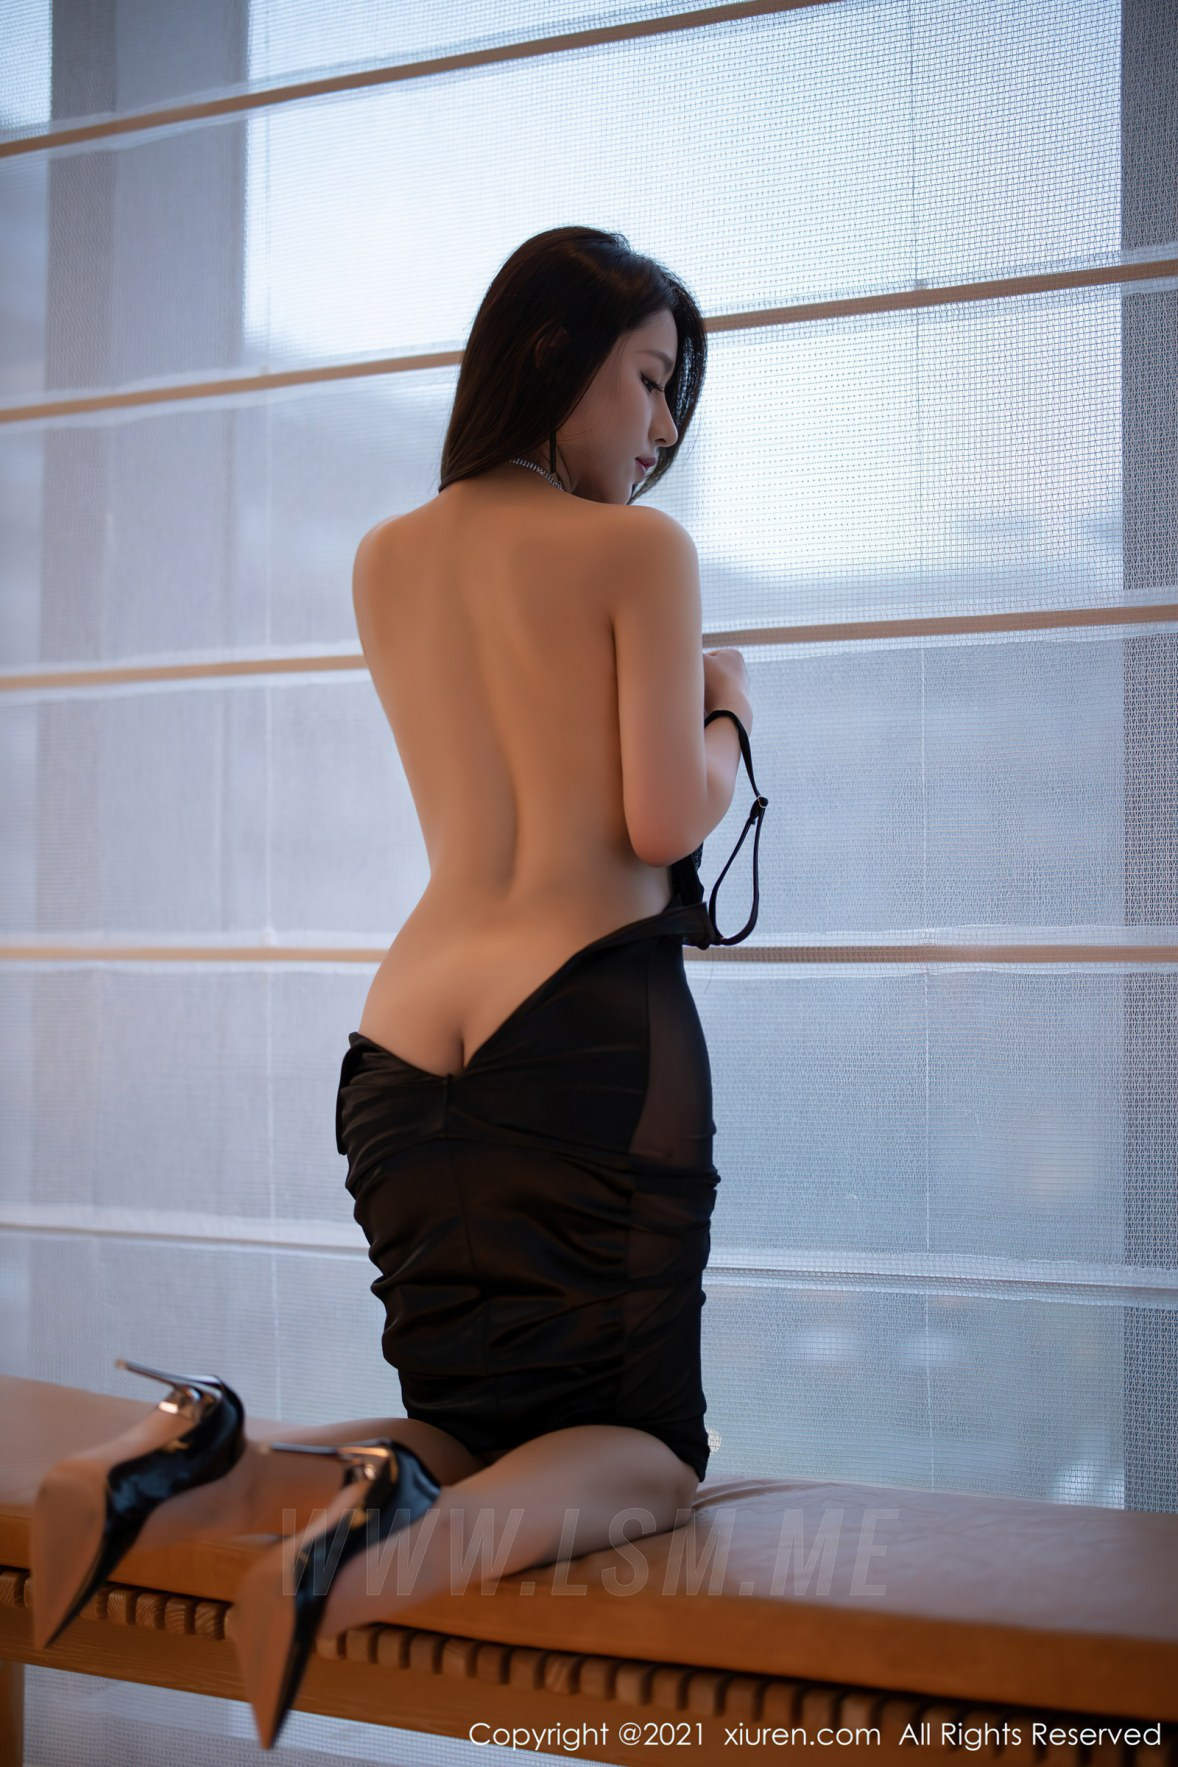 3465 045 s1u 3600 5400 - XiuRen 秀人 No.3465  黑色吊裙 徐安安 三亚旅拍写真 - 秀人网 -【免费在线写真】【丽人丝语】